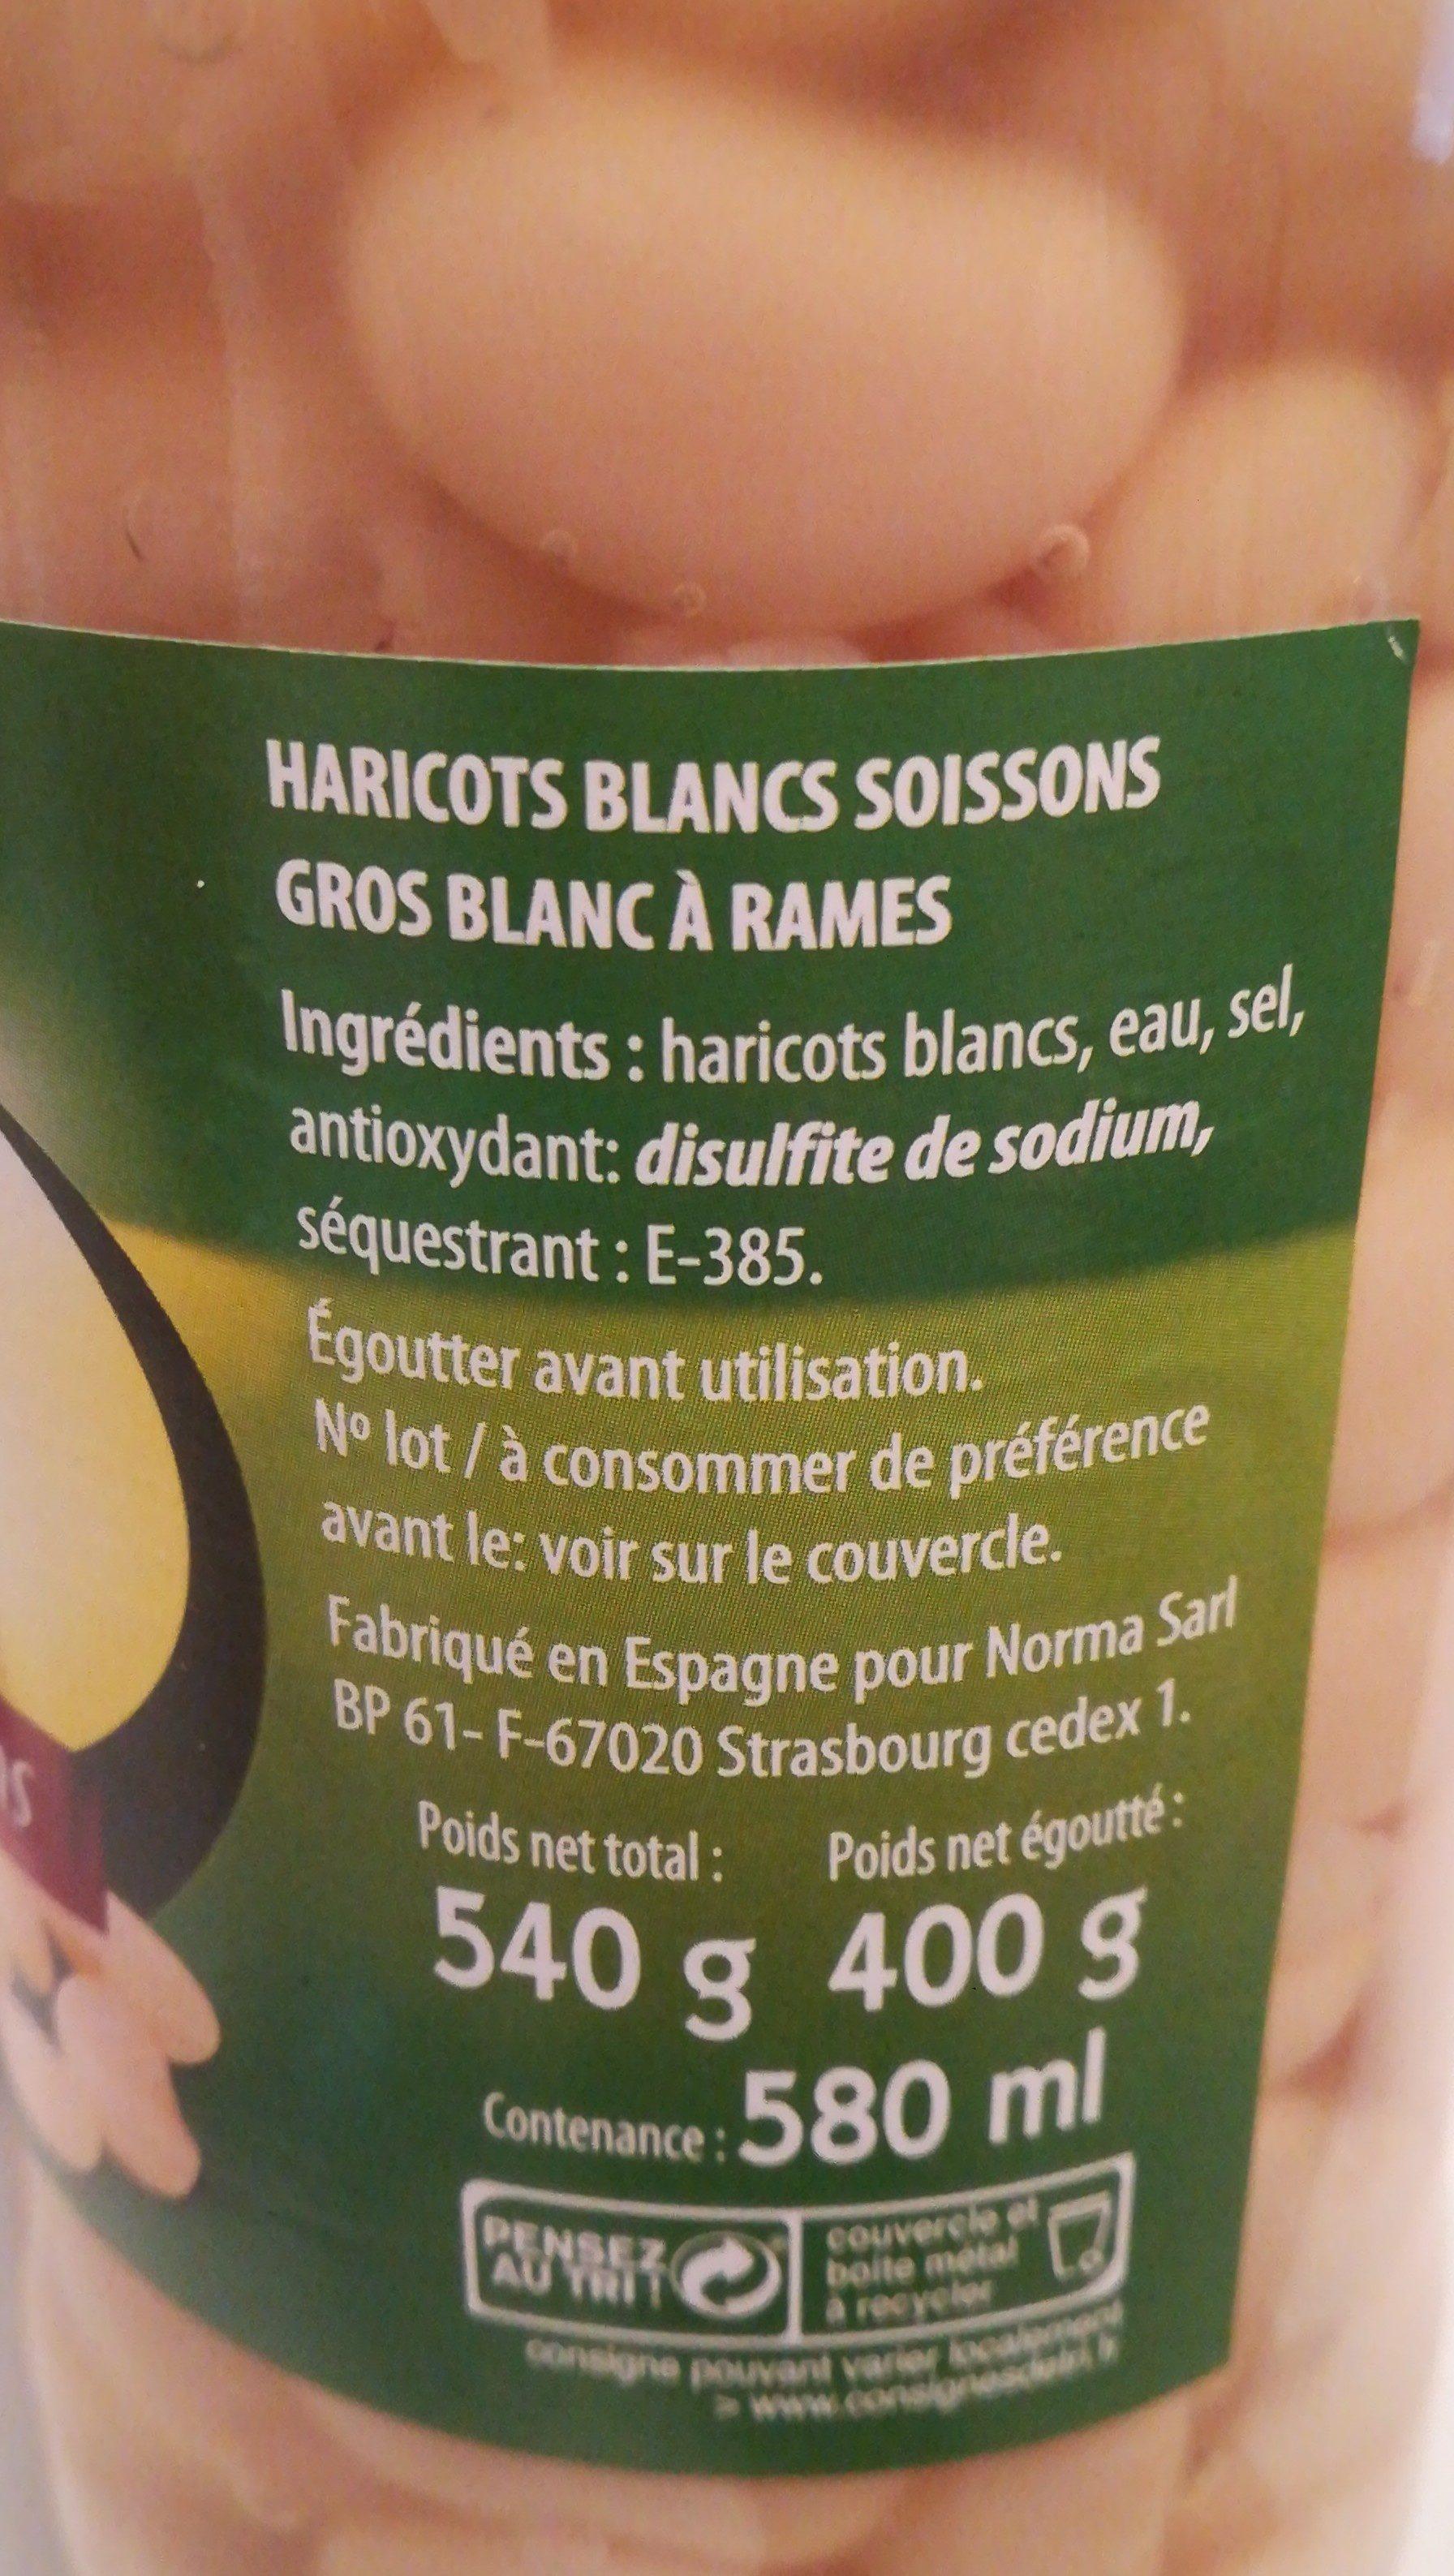 Haricot blancs - Ingrédients - fr